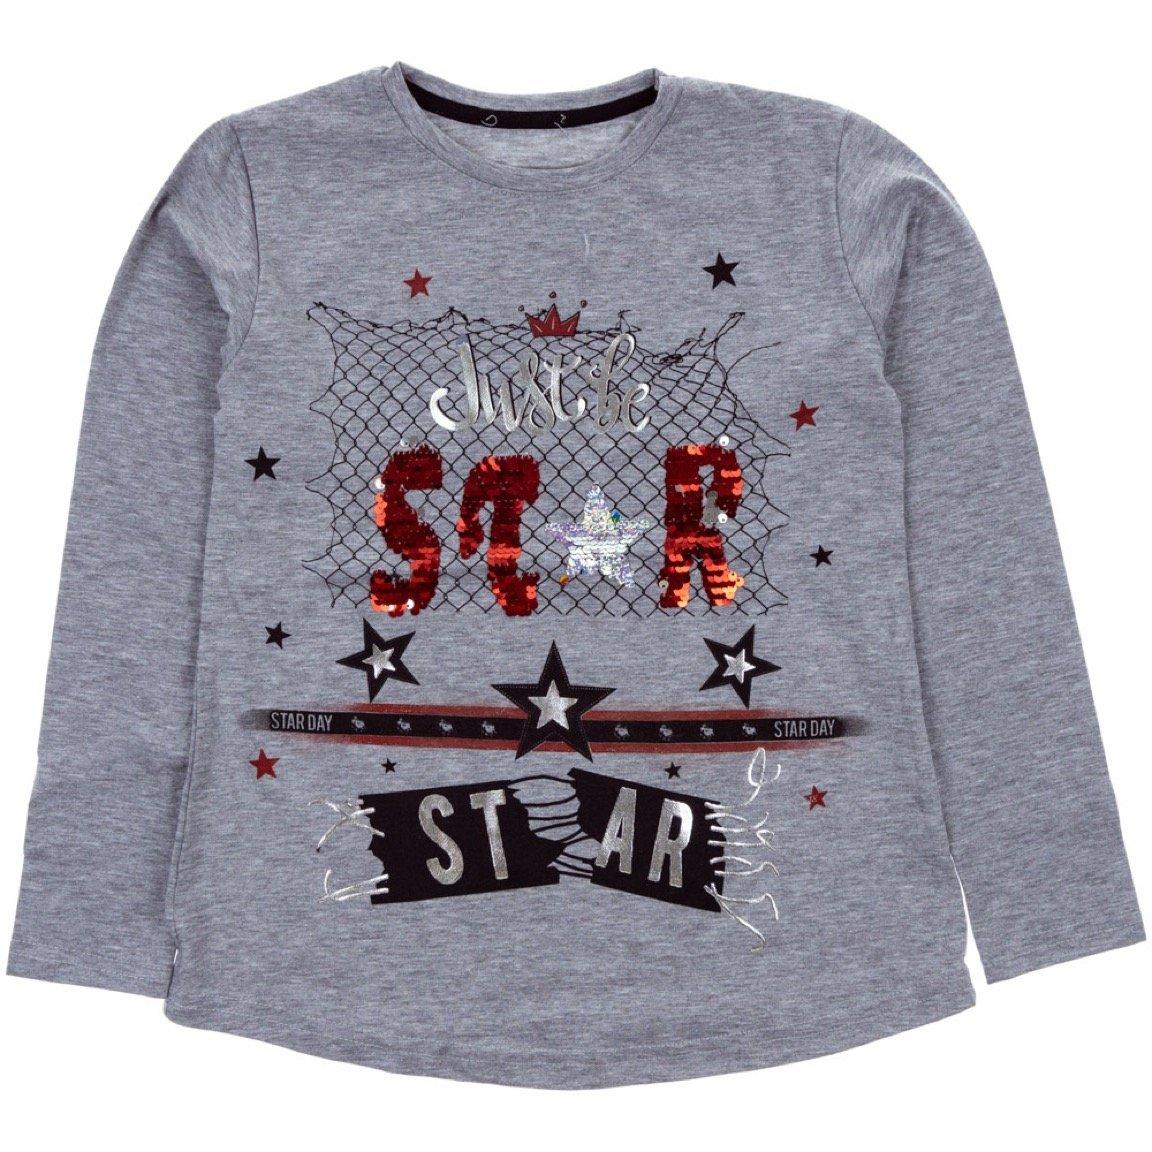 ARS παιδική εποχιακή μπλούζα «Grey Star Day»